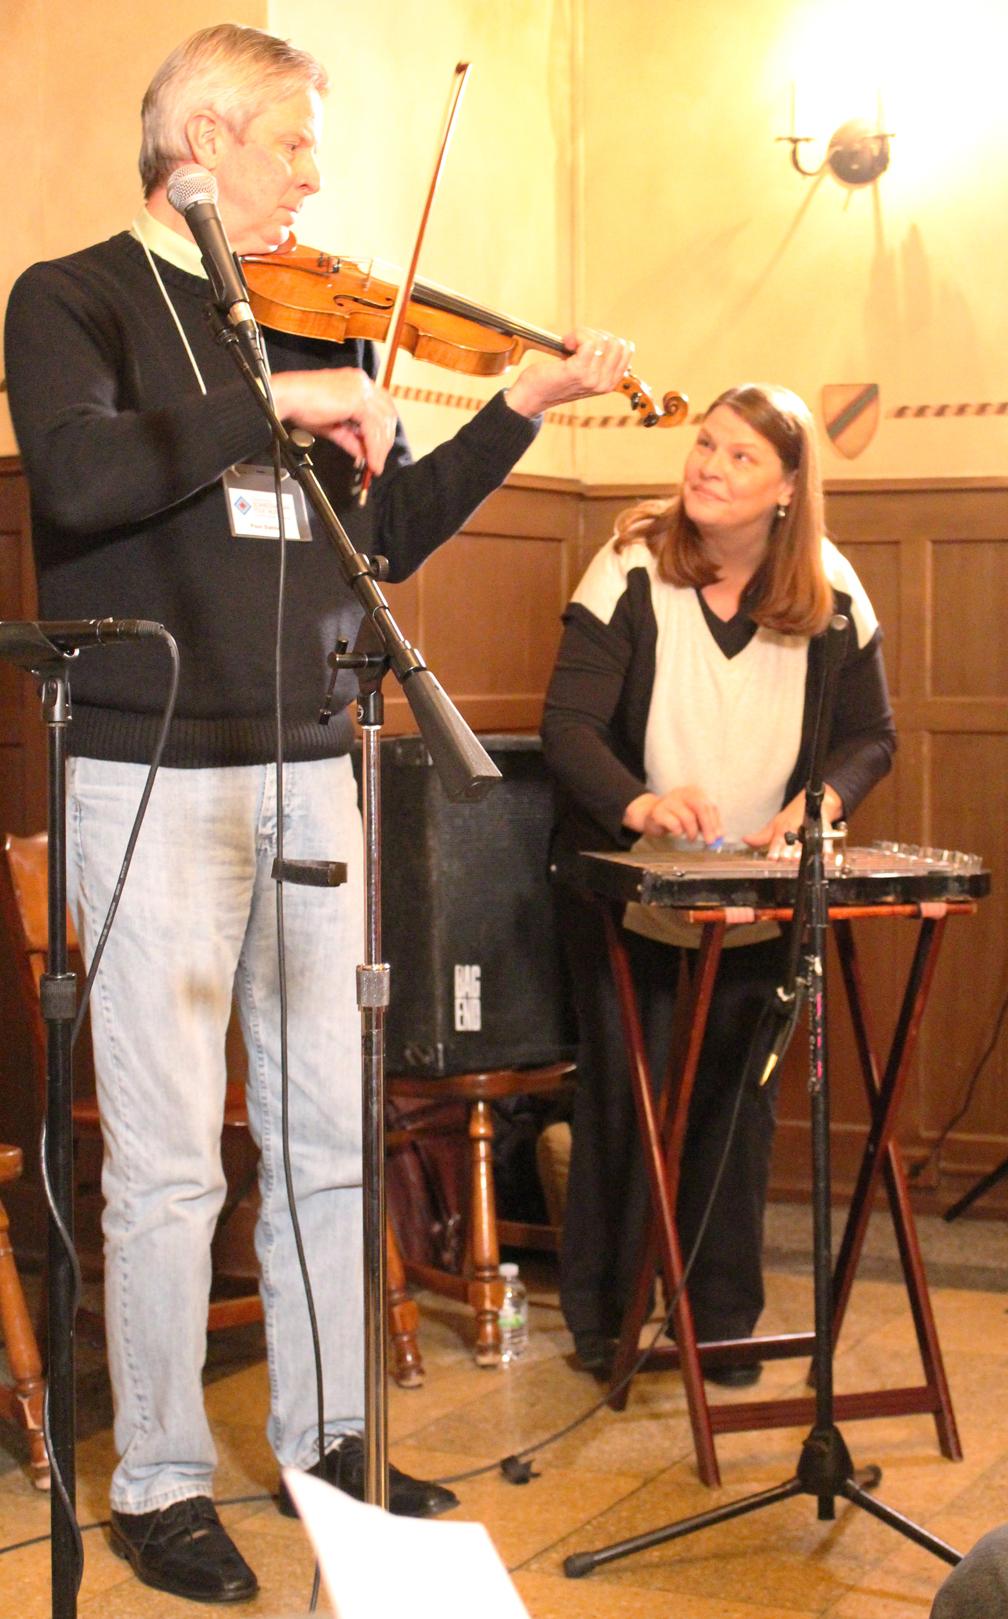 Paul and Marikay Dahlin perform at the University Club, Madison, WI